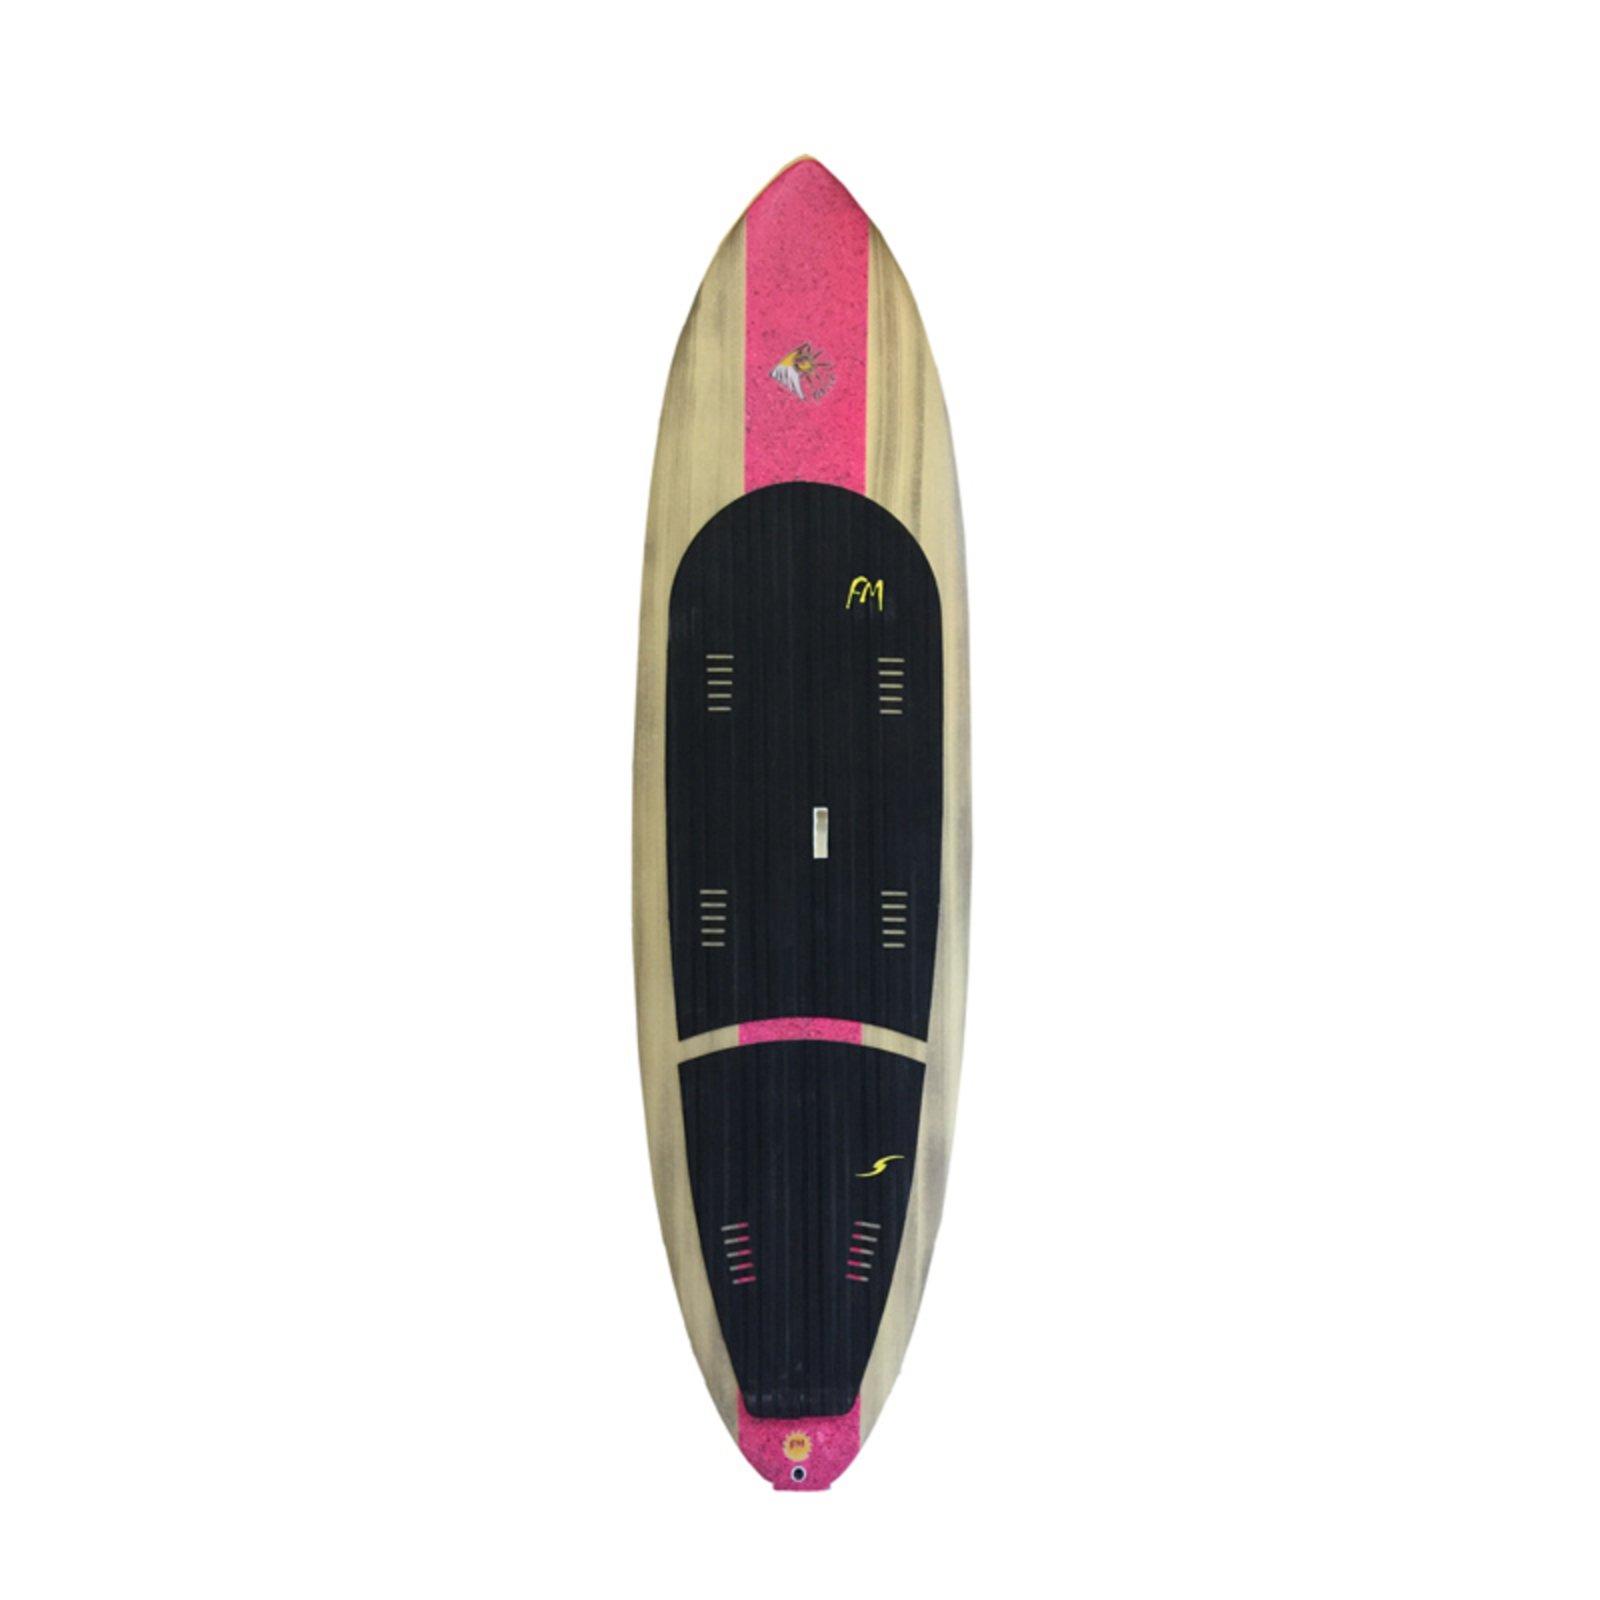 8c8d63533 Prancha Fm Surf Stand Up Paddle Hibrida Vênus - Compre Agora